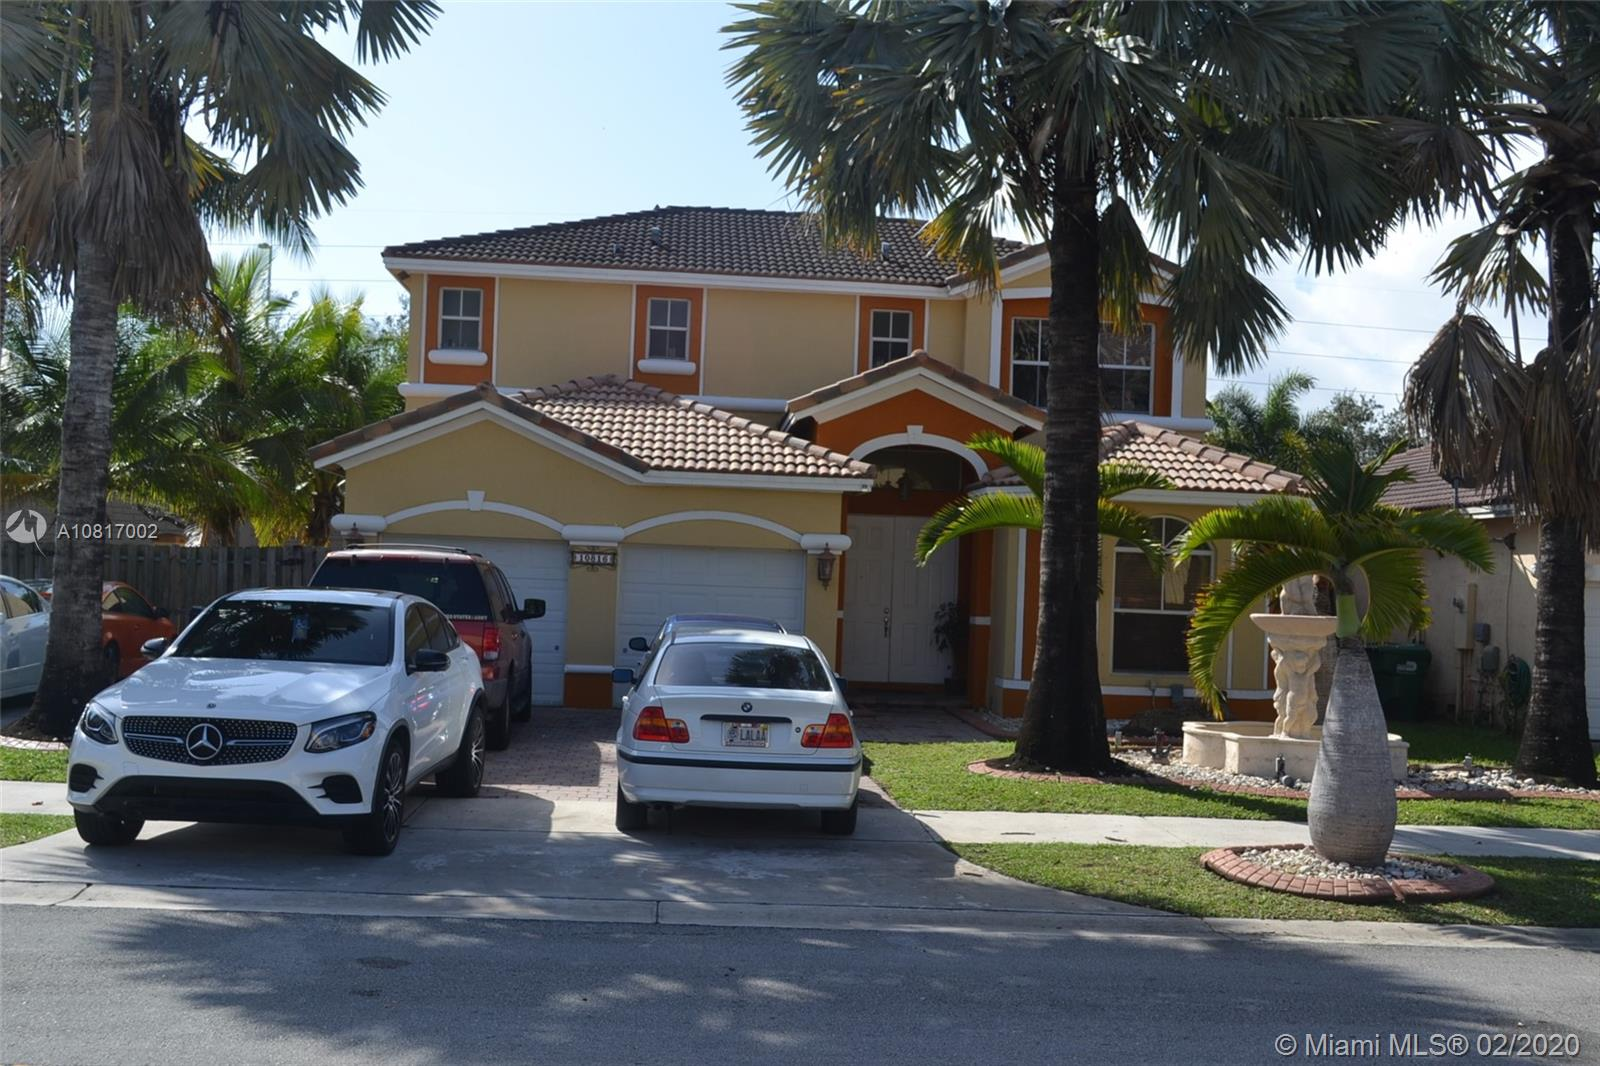 10816 SW 247th St, Homestead, FL 33032 - Homestead, FL real estate listing